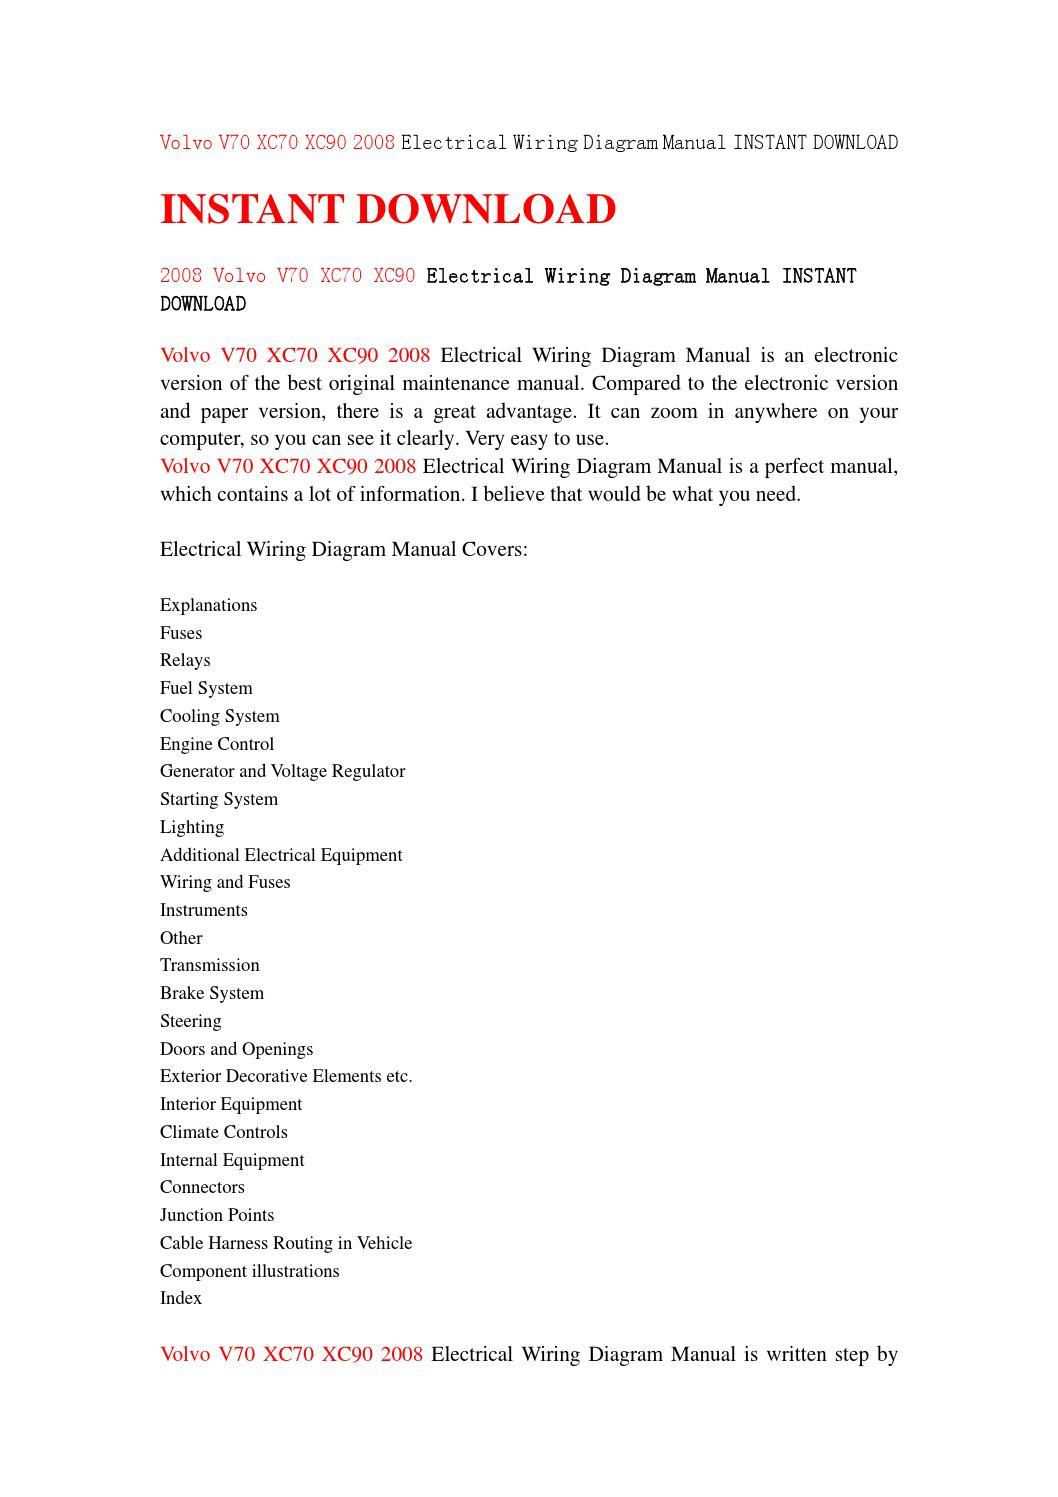 hight resolution of volvo v70 xc70 xc90 2008 electrical wiring diagram manual instant wiring diagram volvo v70 2008